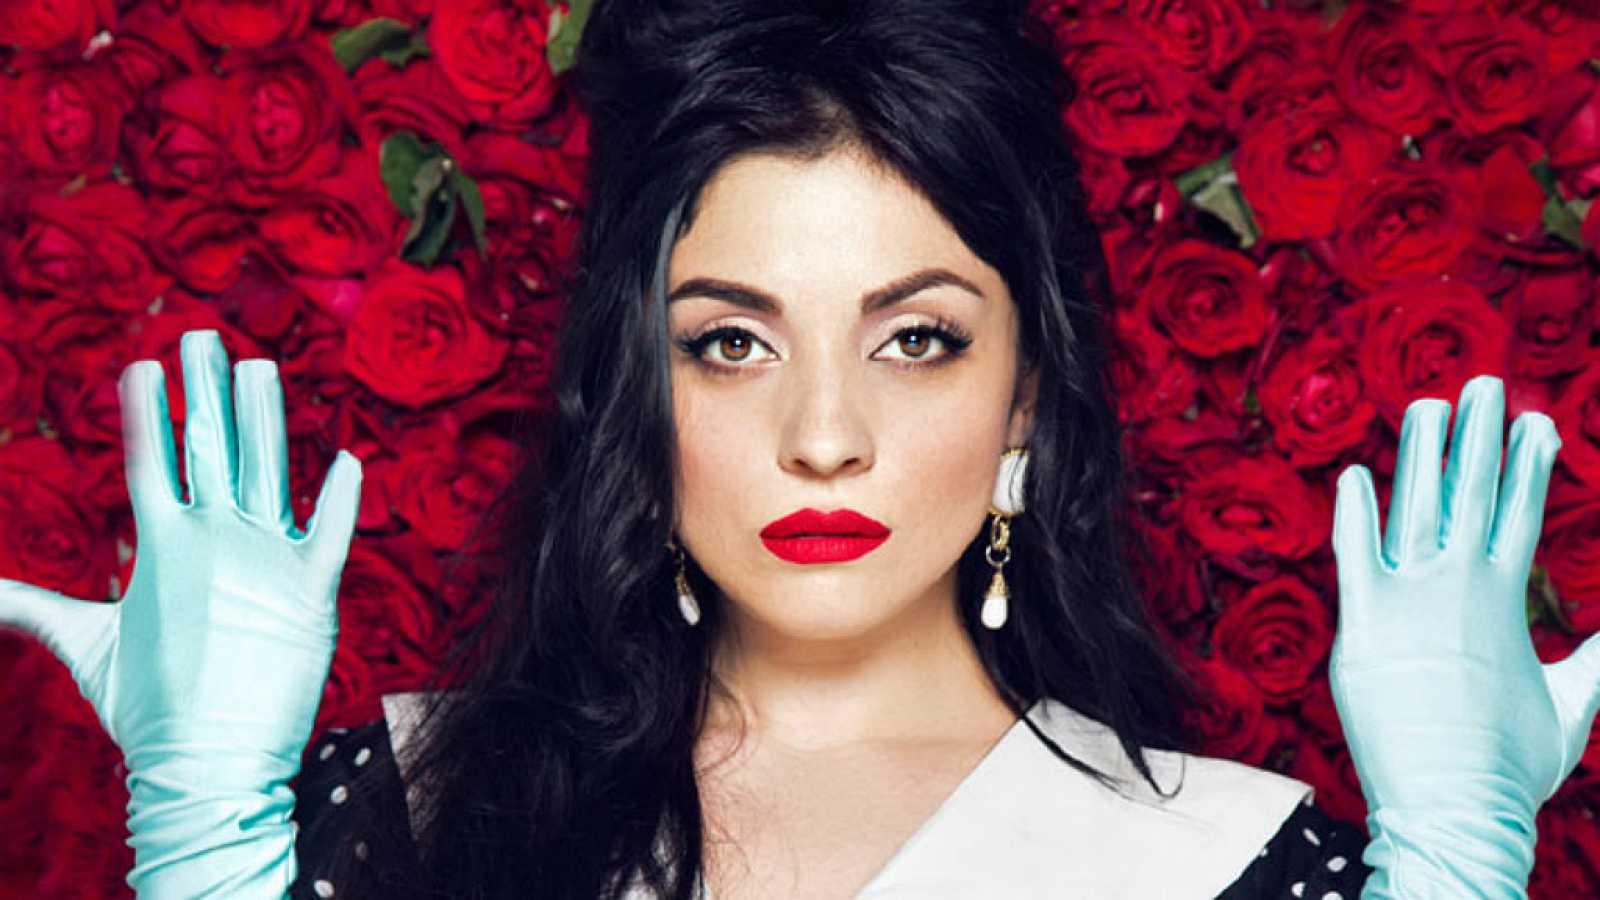 Hora América en Radio 5 - 'Norma', de Mon Laferte - 23/10/18 - Escuchar ahora